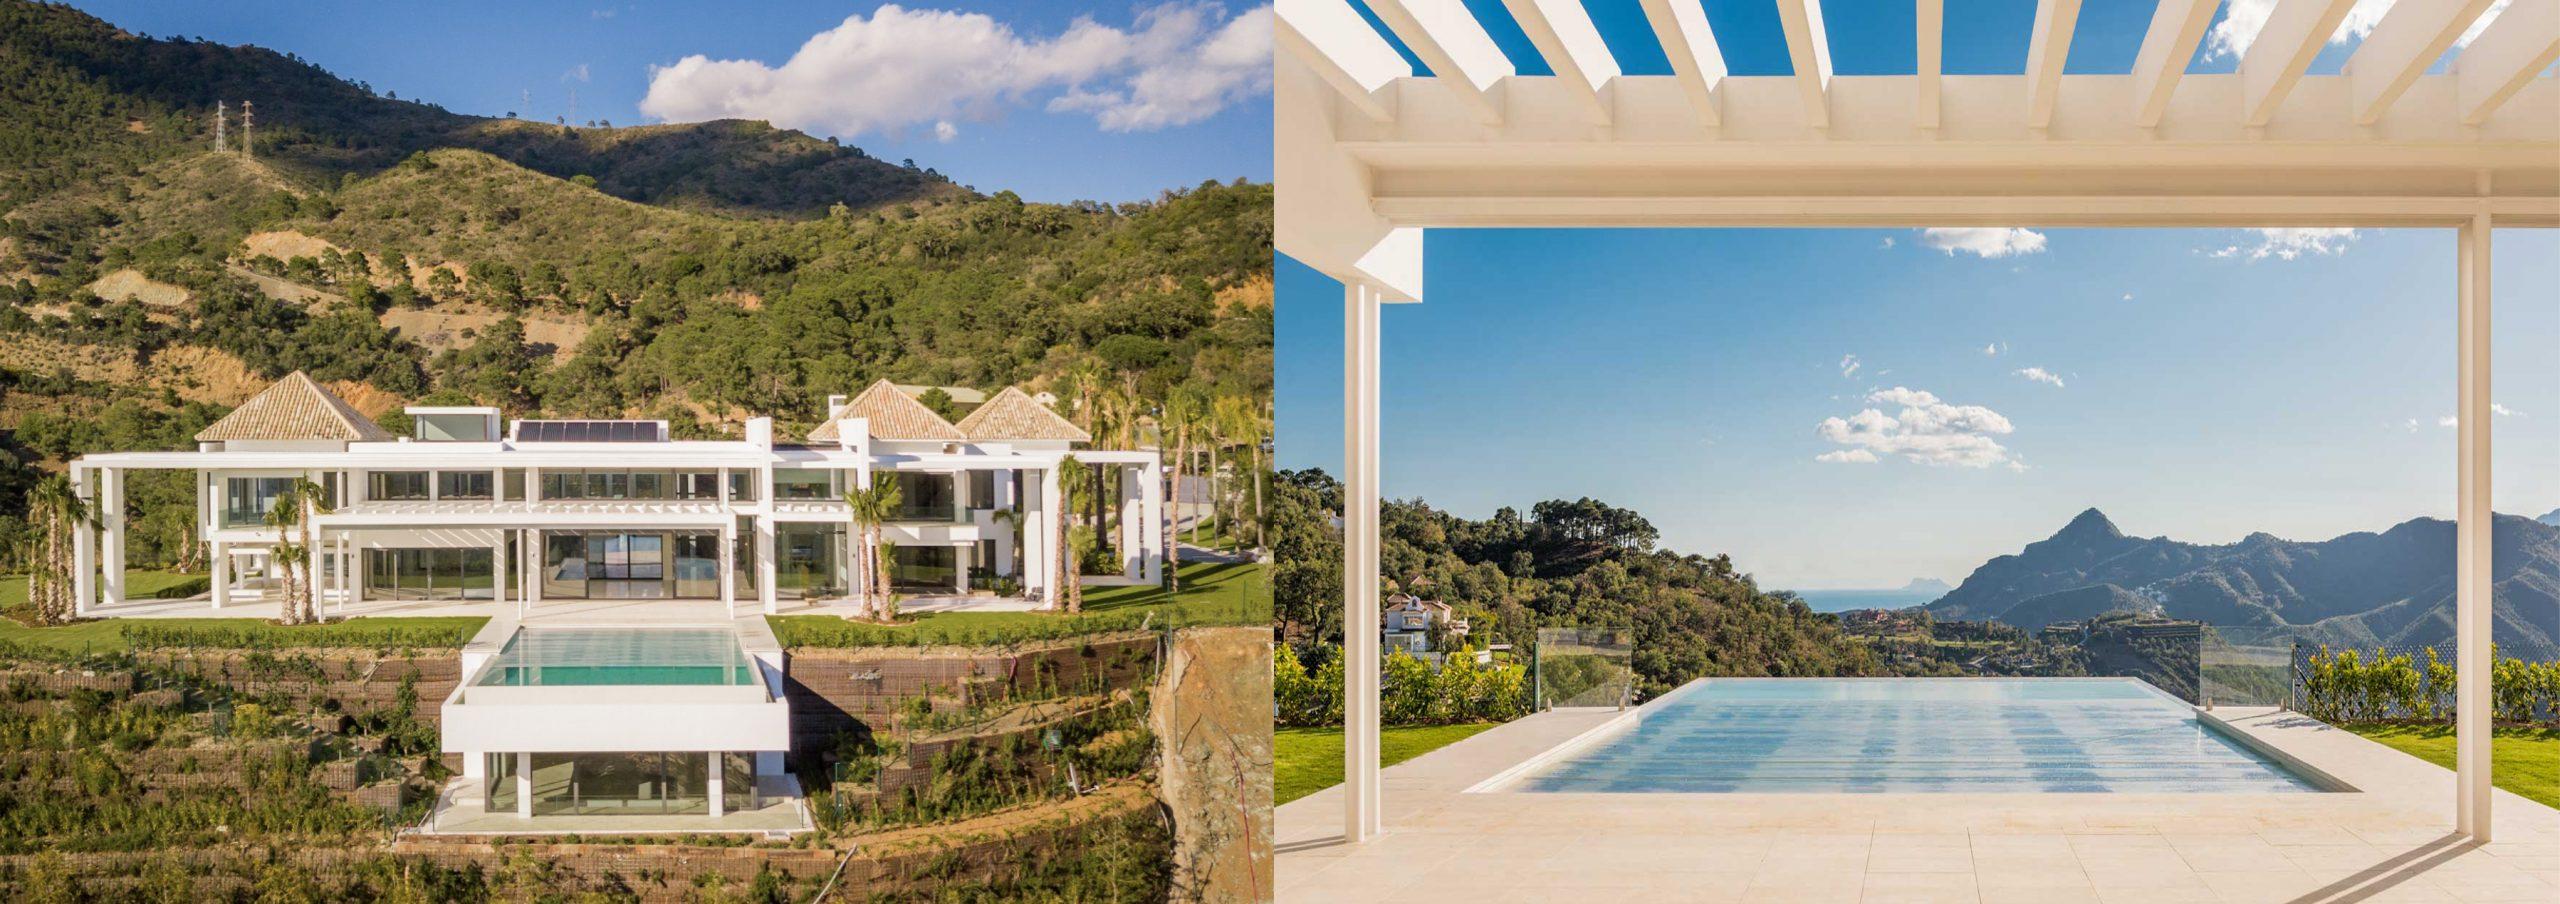 Villa Halcyon i La Zagaleta